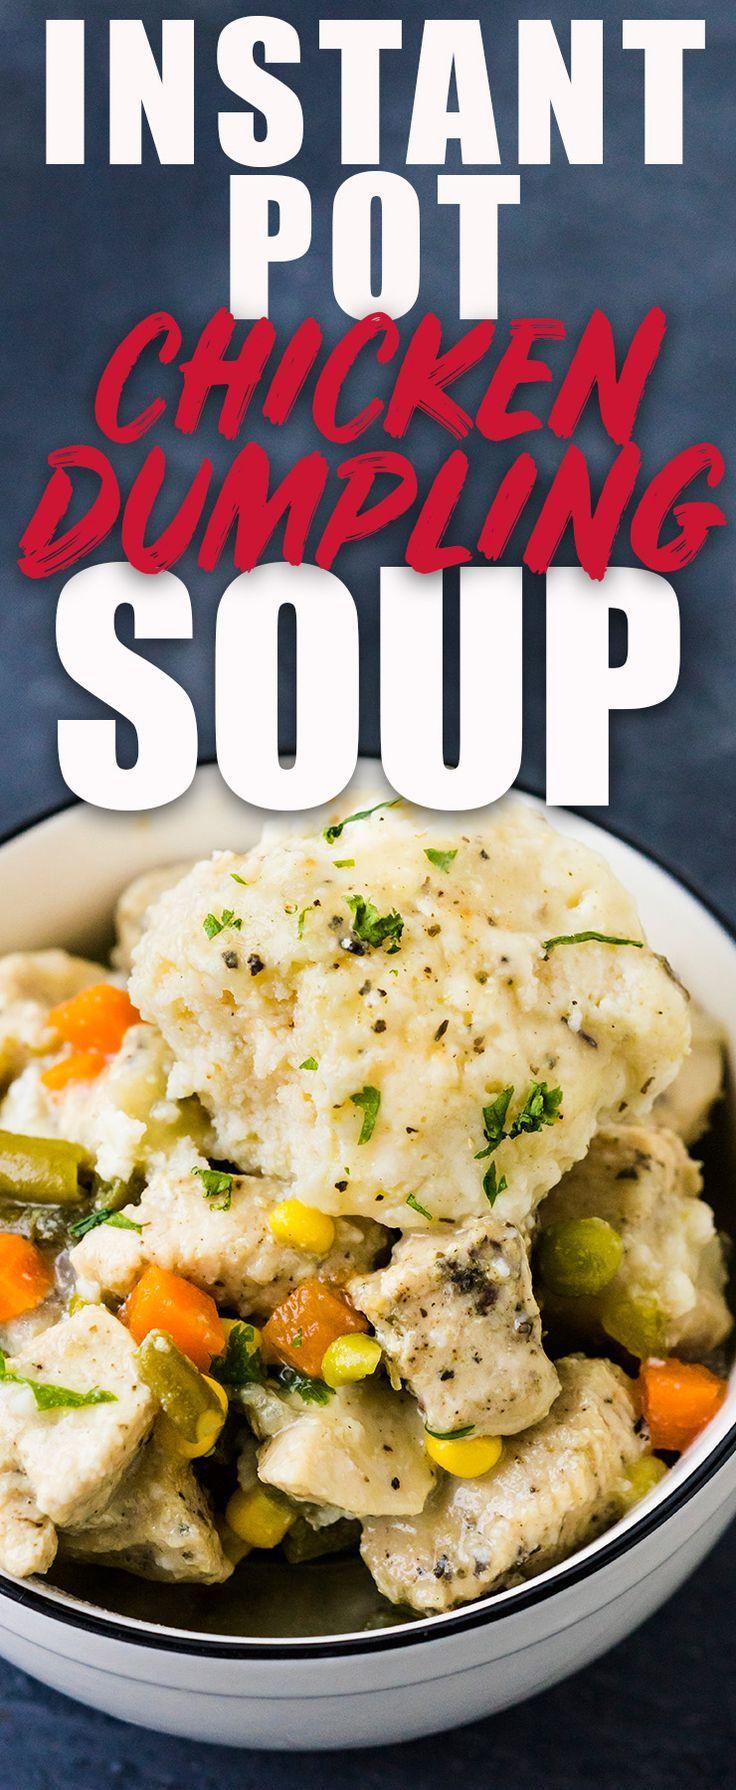 Instant pot chicken dumpling soup recipe instantpotrecipes food instant pot chicken dumpling soup recipe forumfinder Gallery